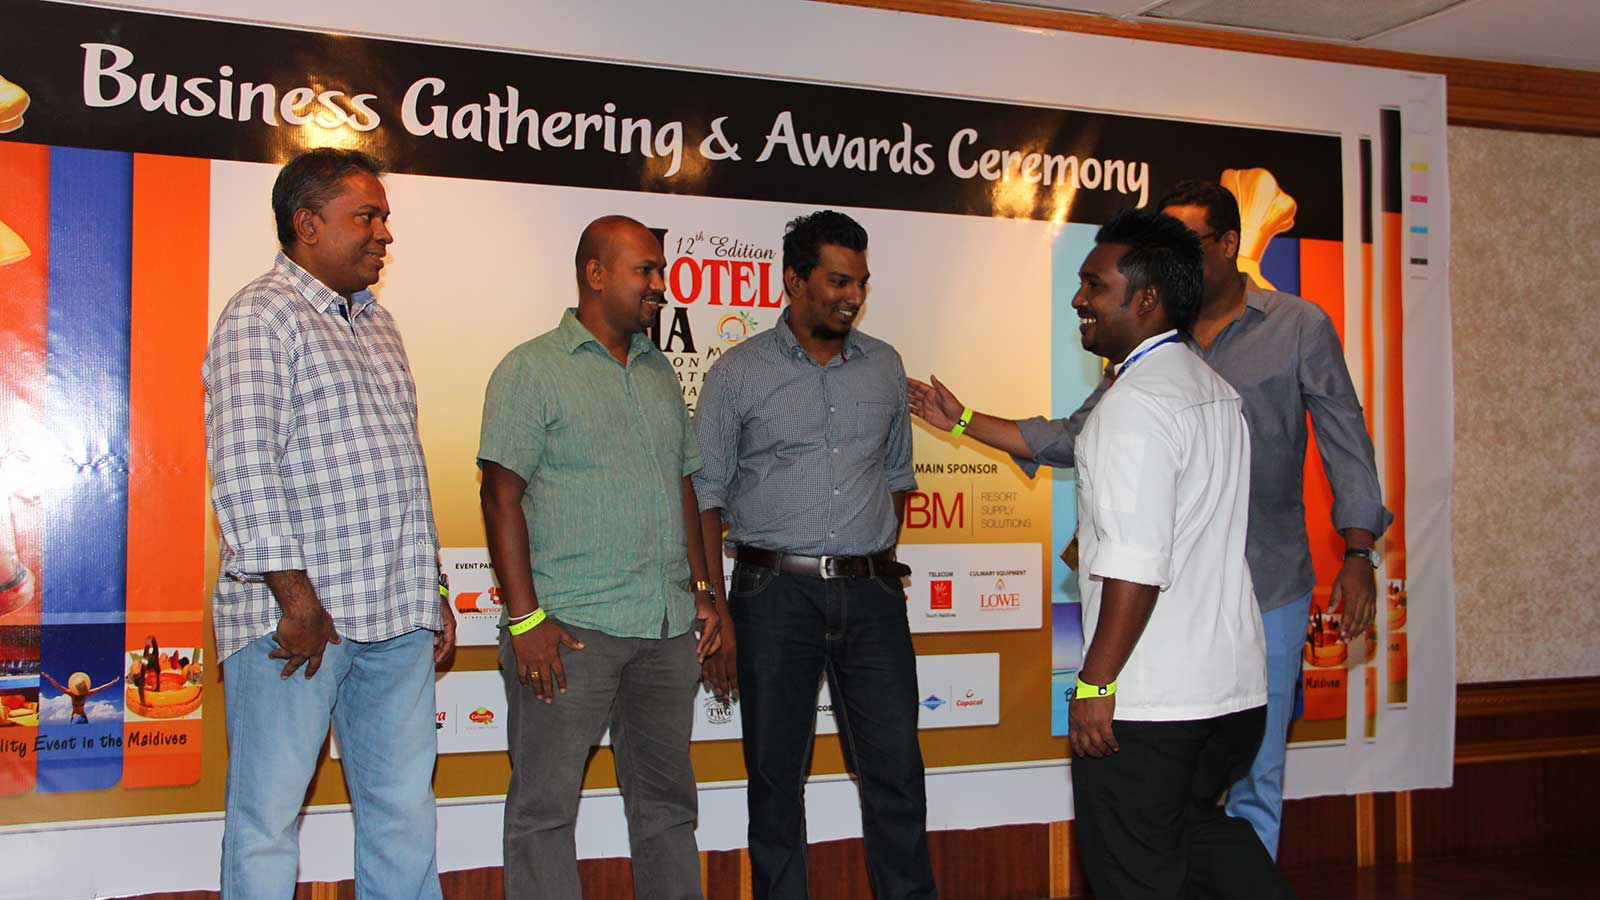 Hotel Asia Culinary Challenge Bestbuy Maldives